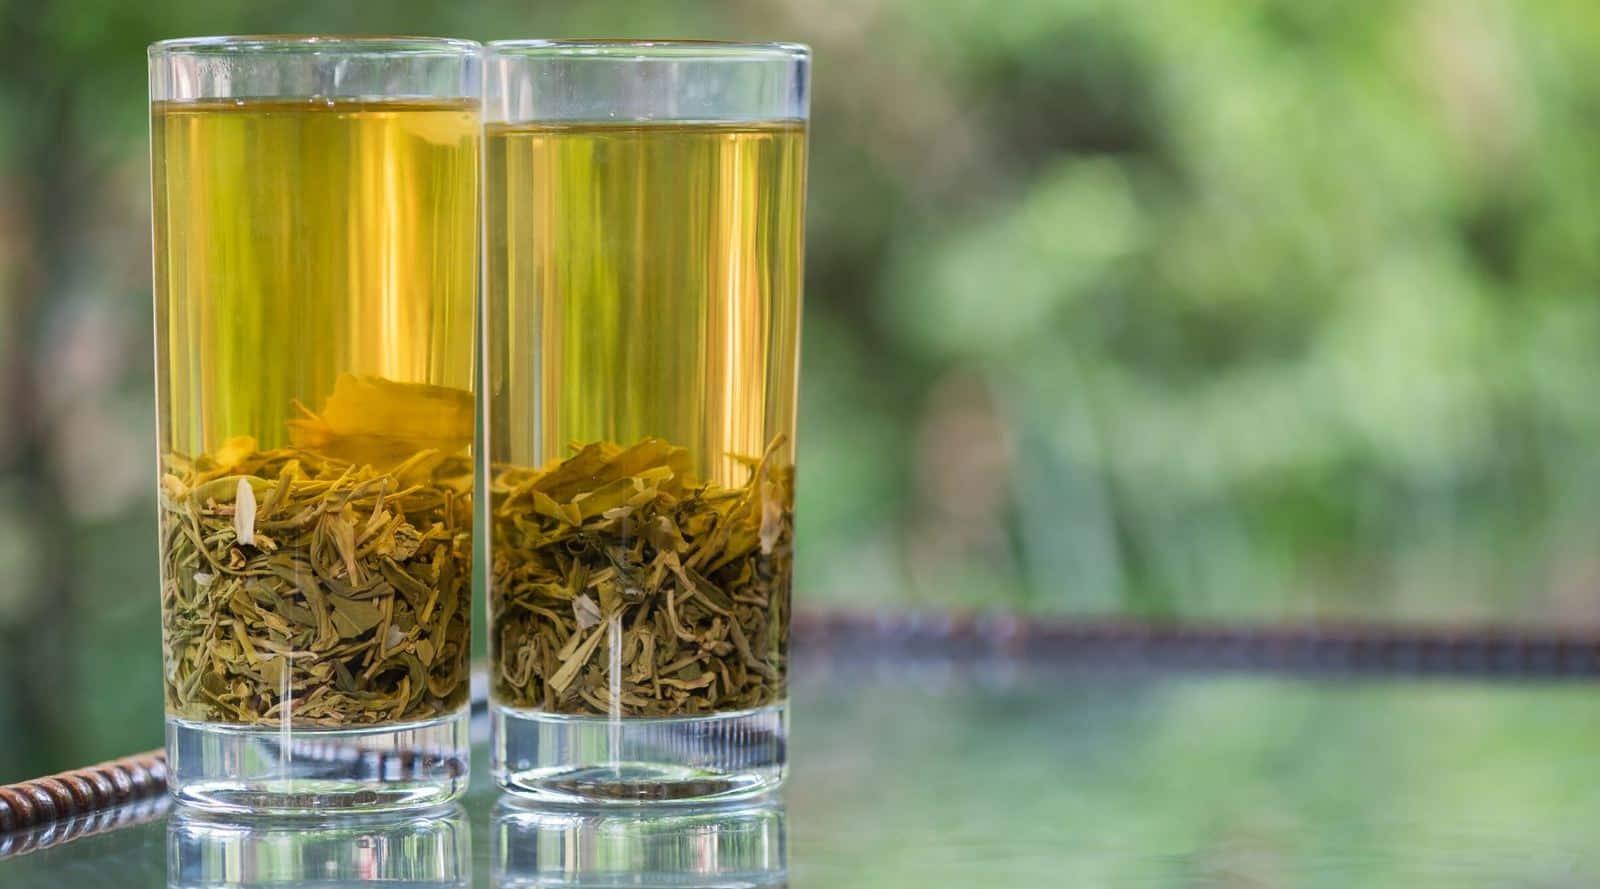 is cold green tea as effective as hot green tea?